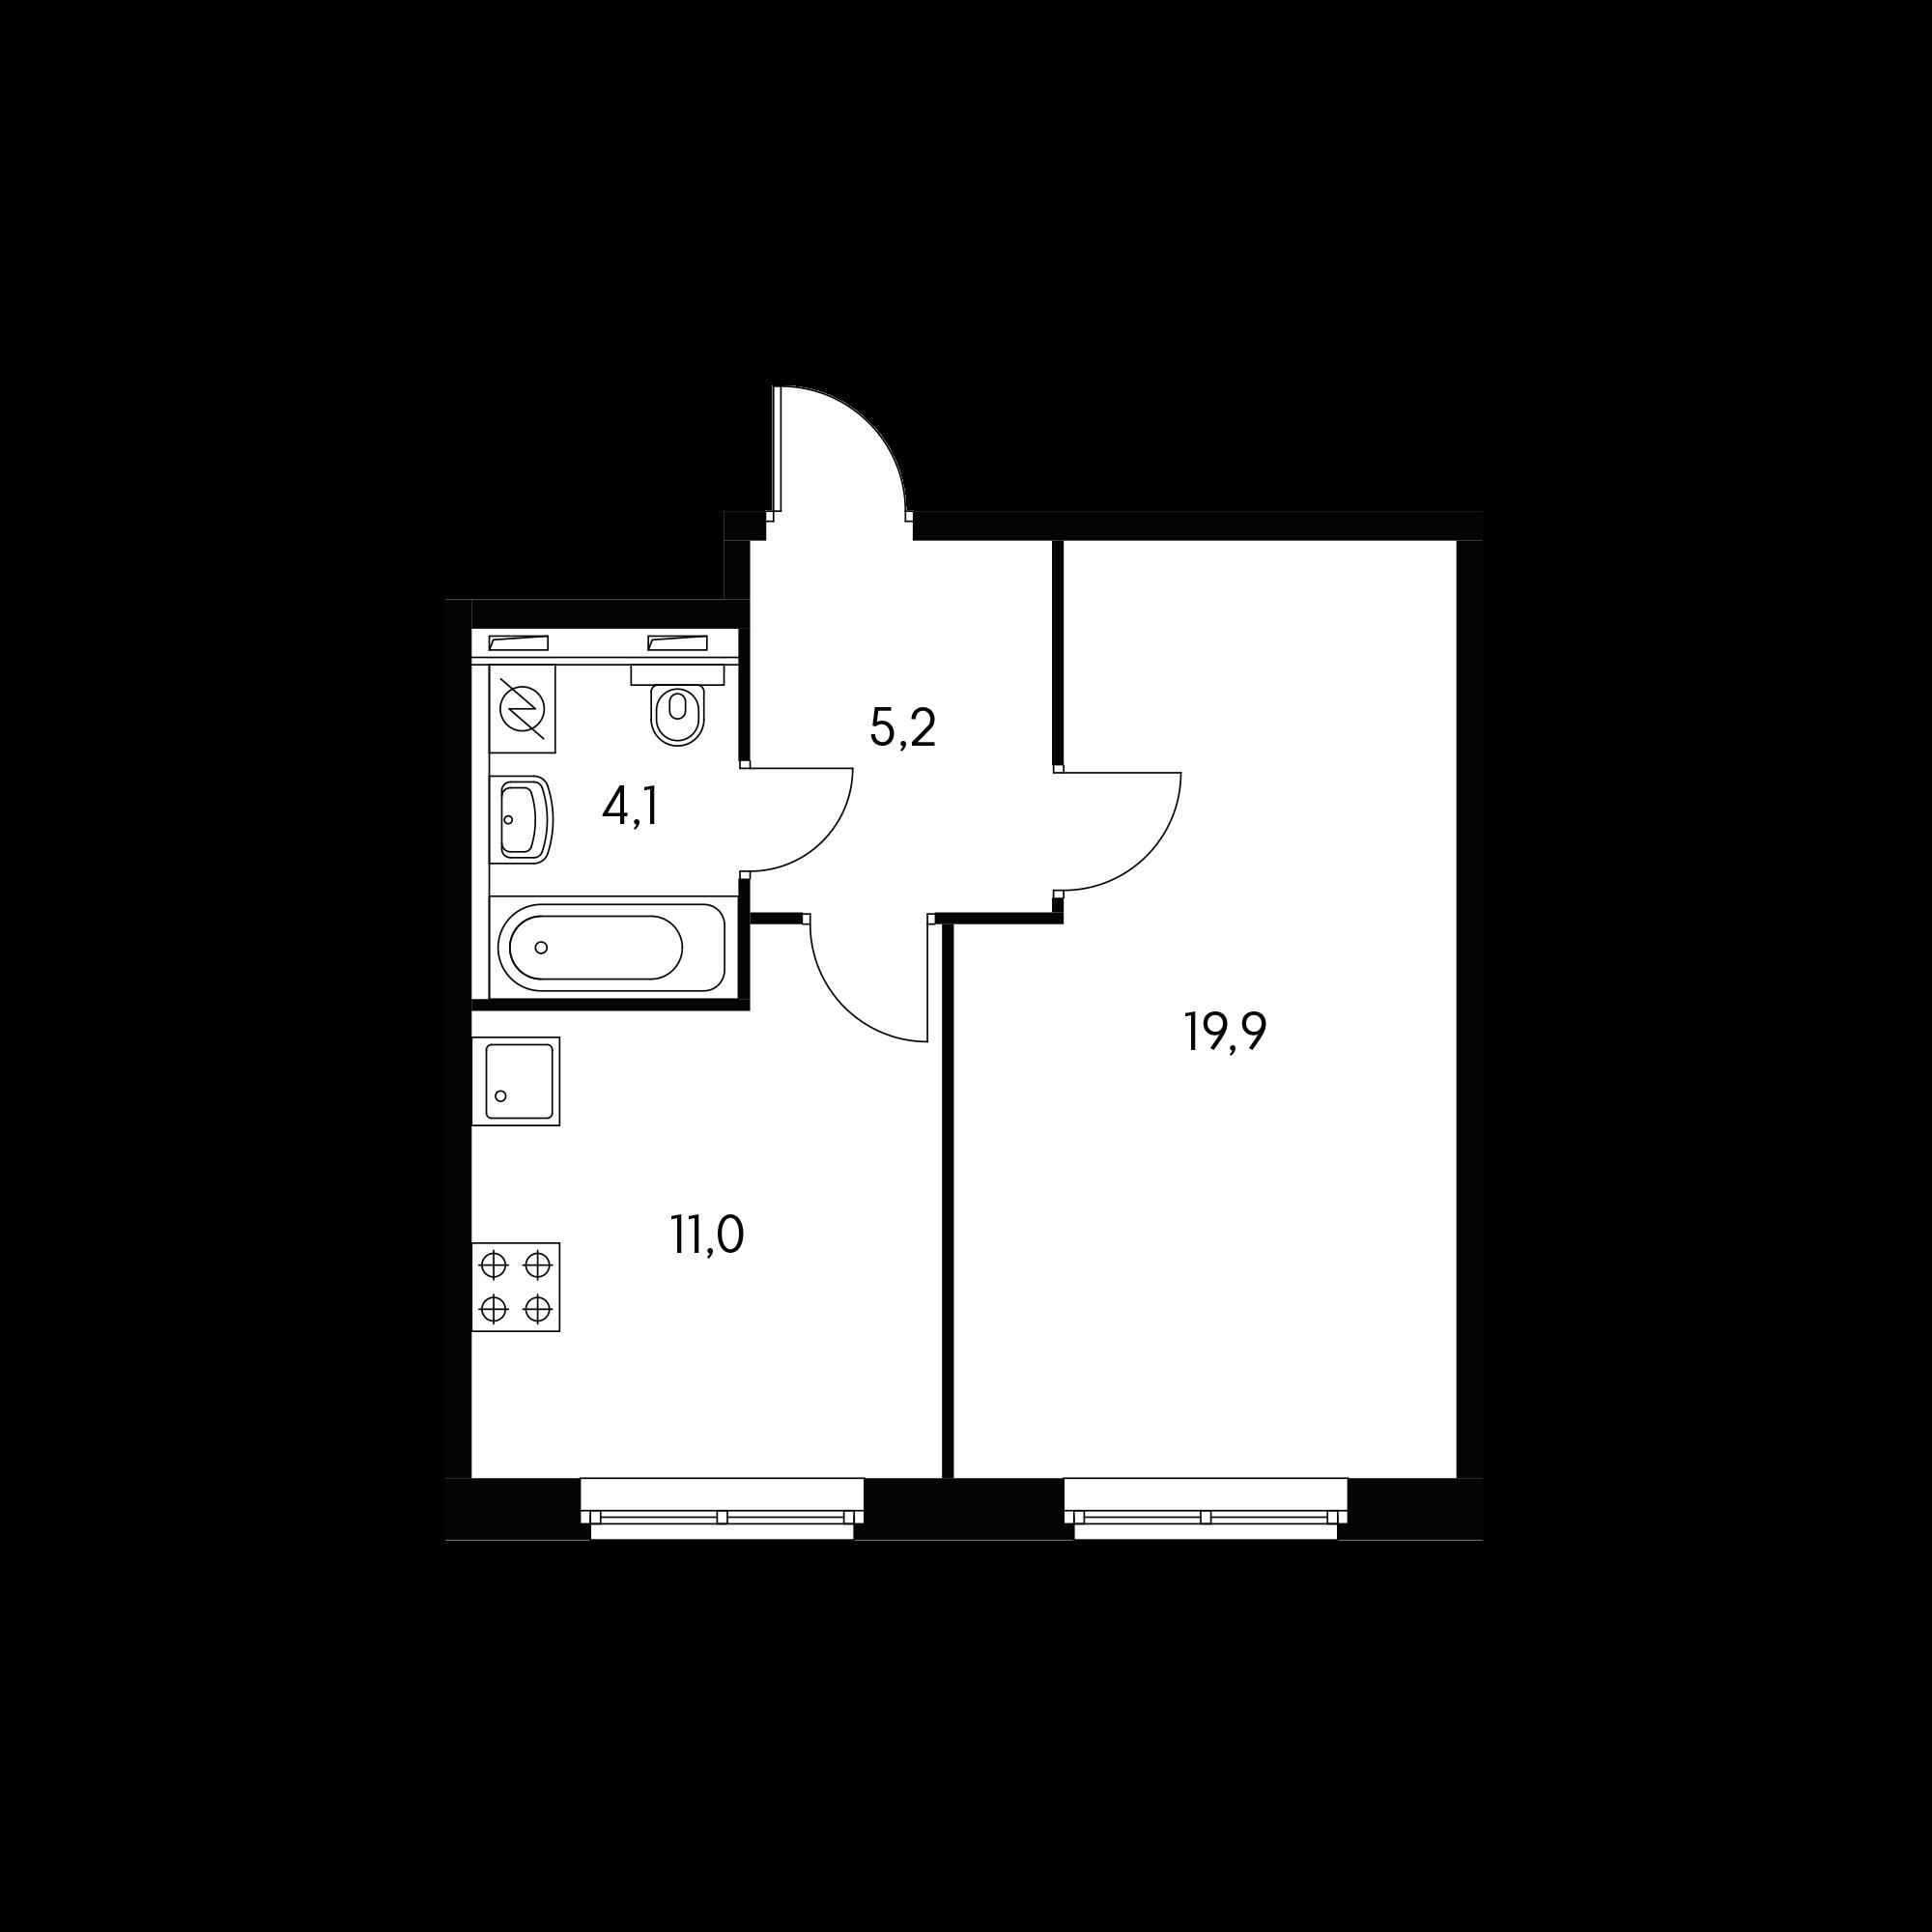 1KM1_6.9-1